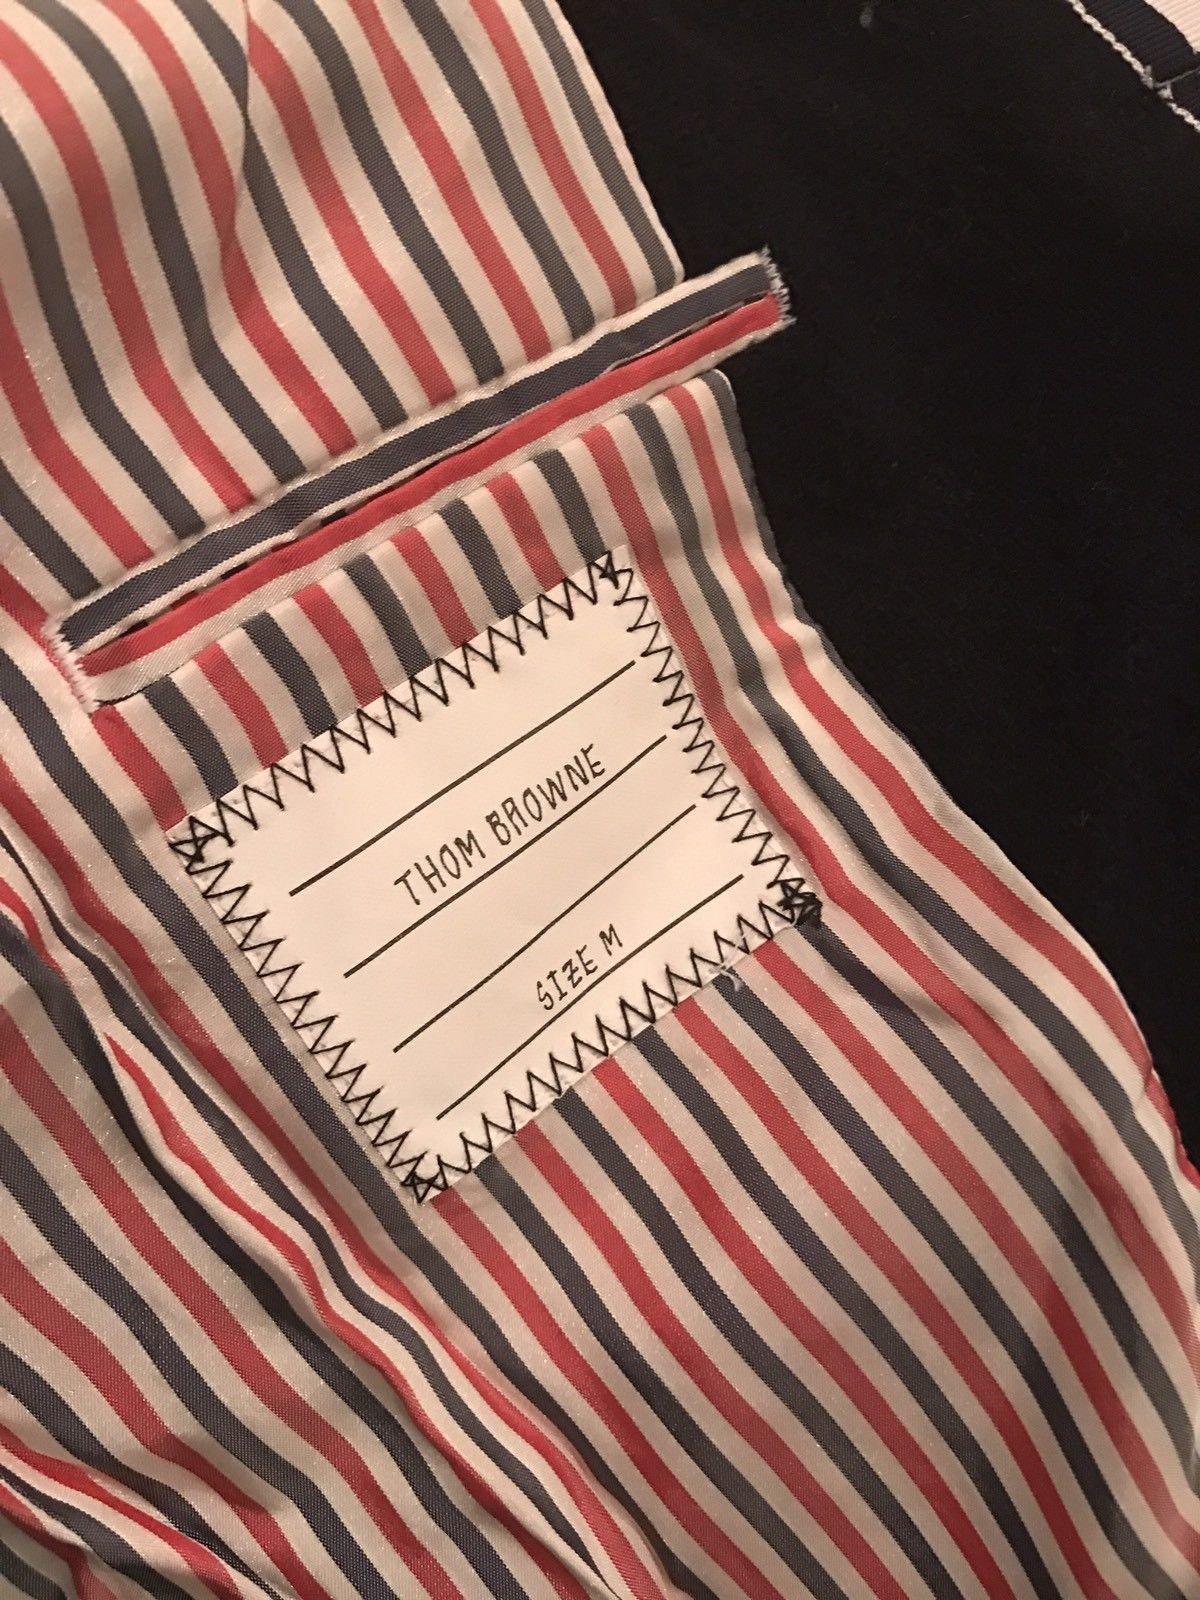 Thom Browne for Neiman Marcus + Target Navy Wool Blazer Size Medium by Thom Browne (Image #3)